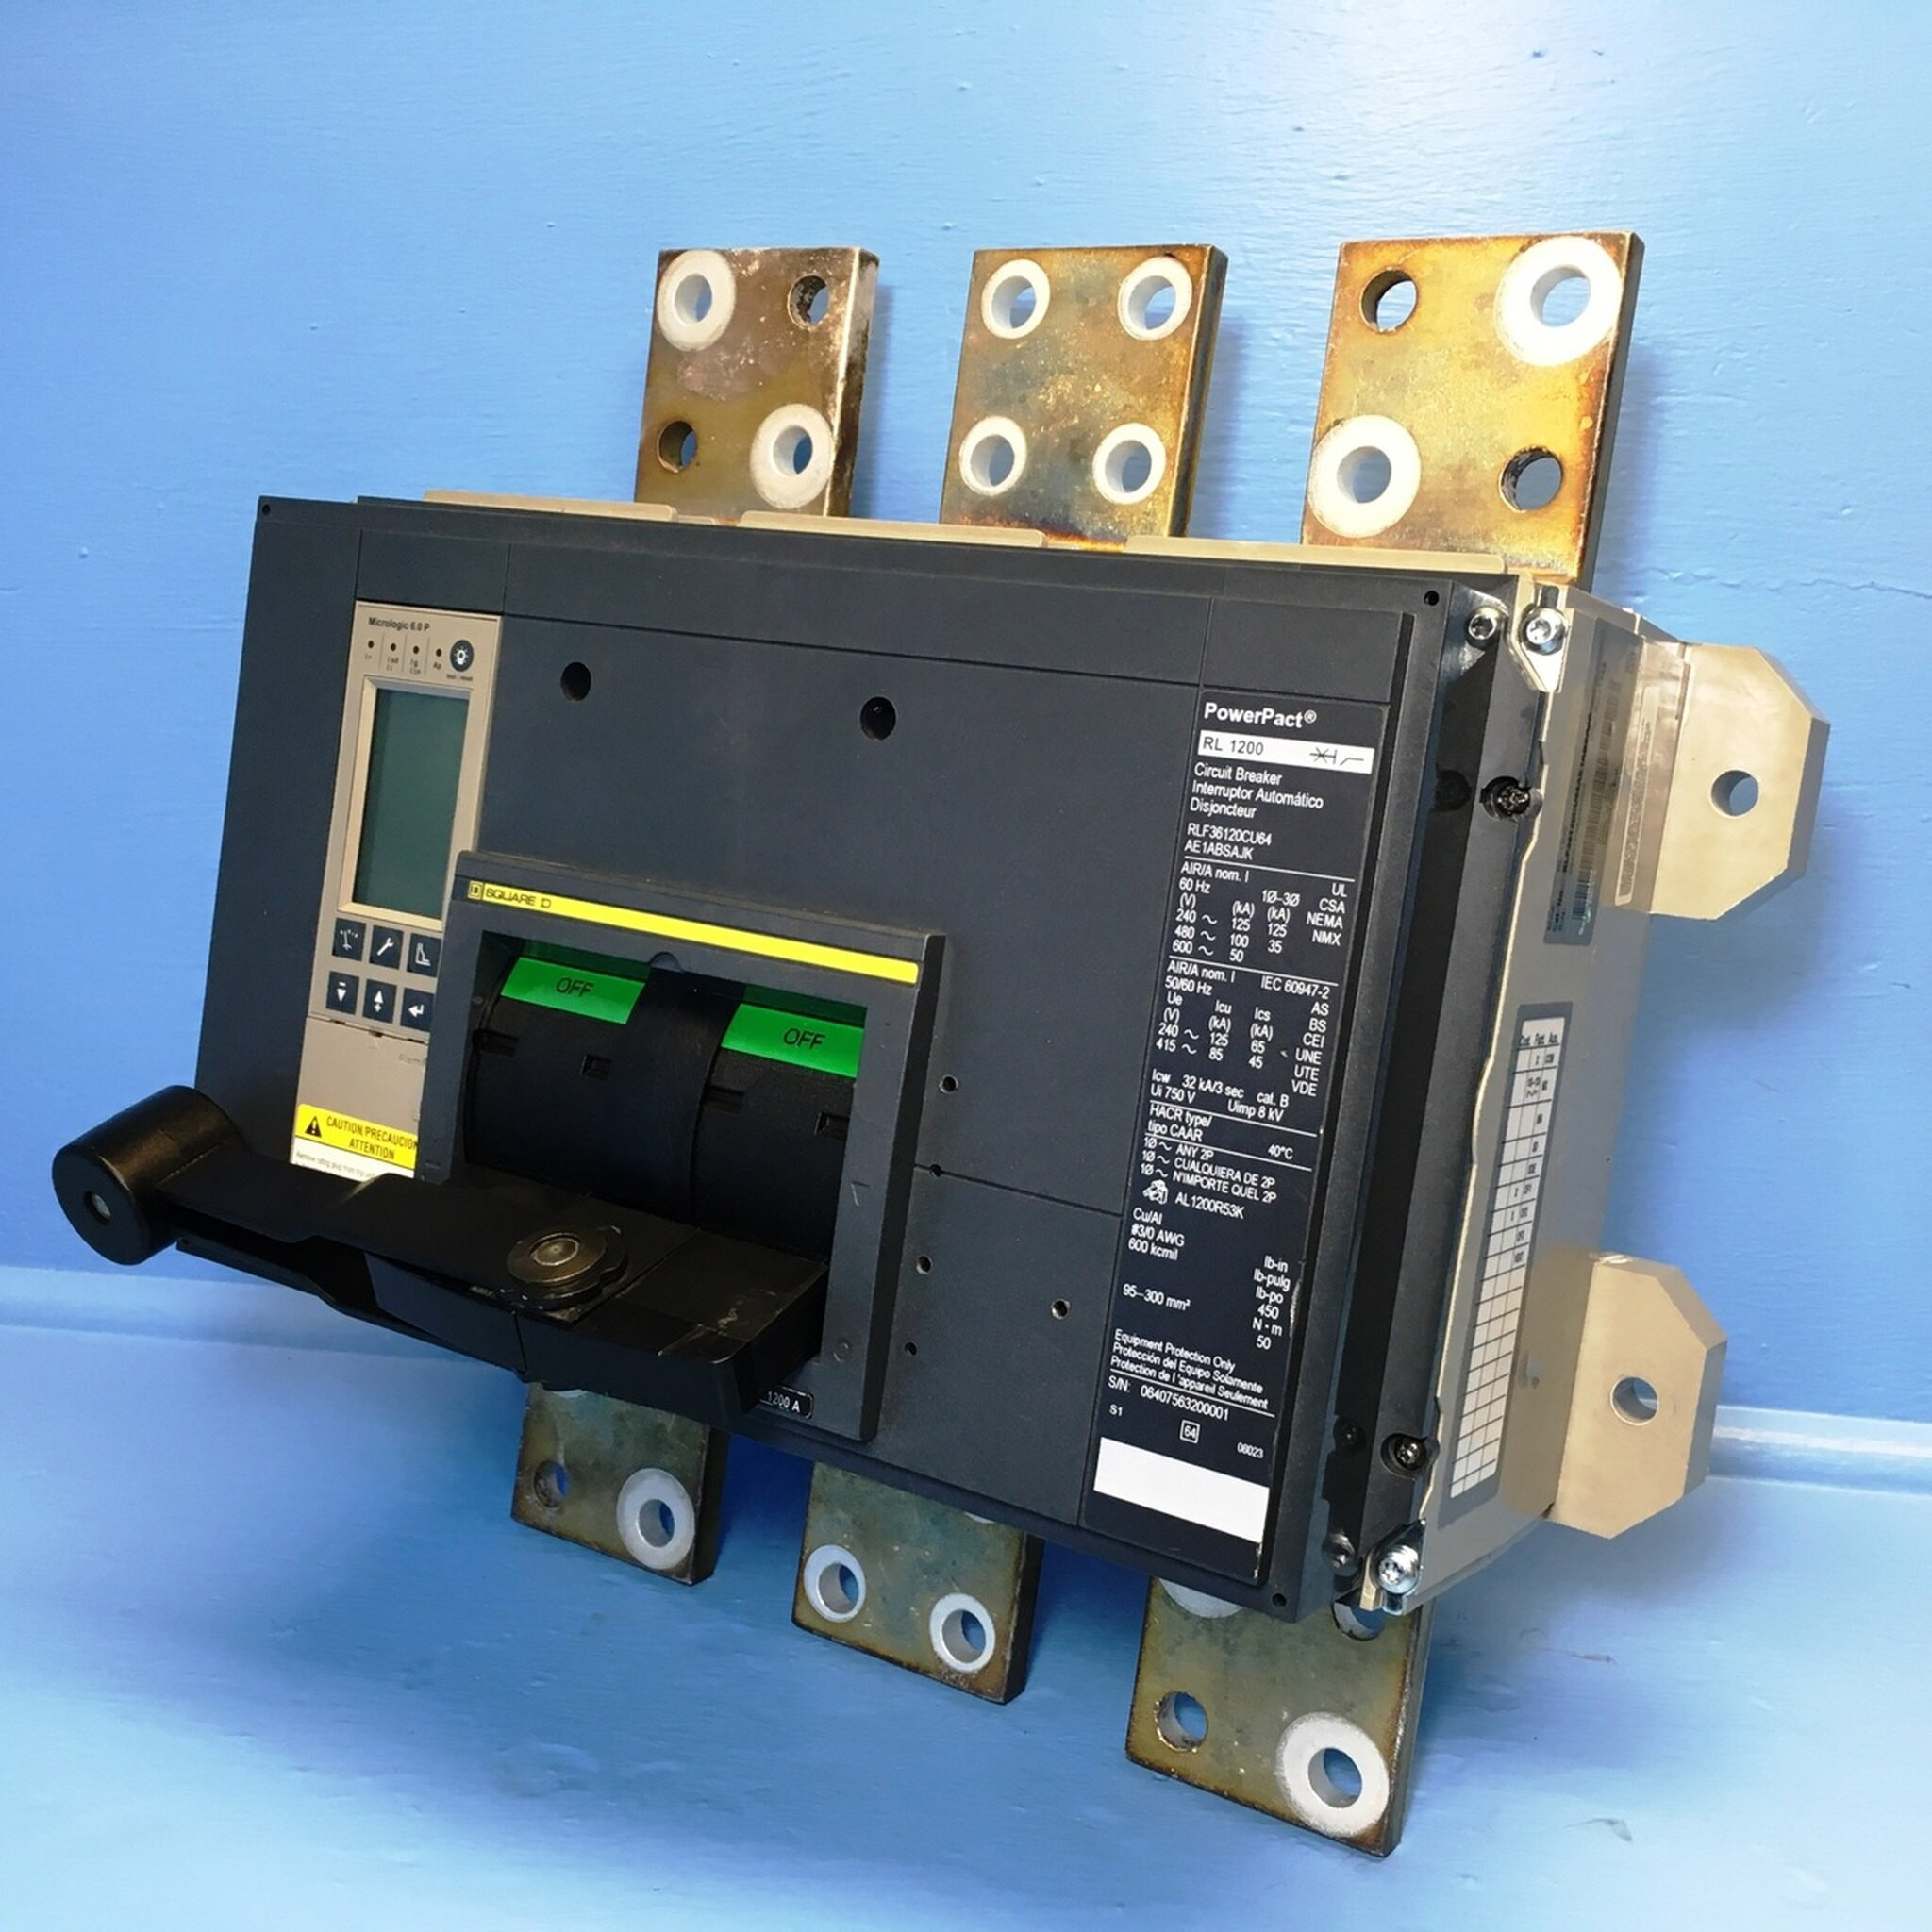 Square D PowerPact Breakers